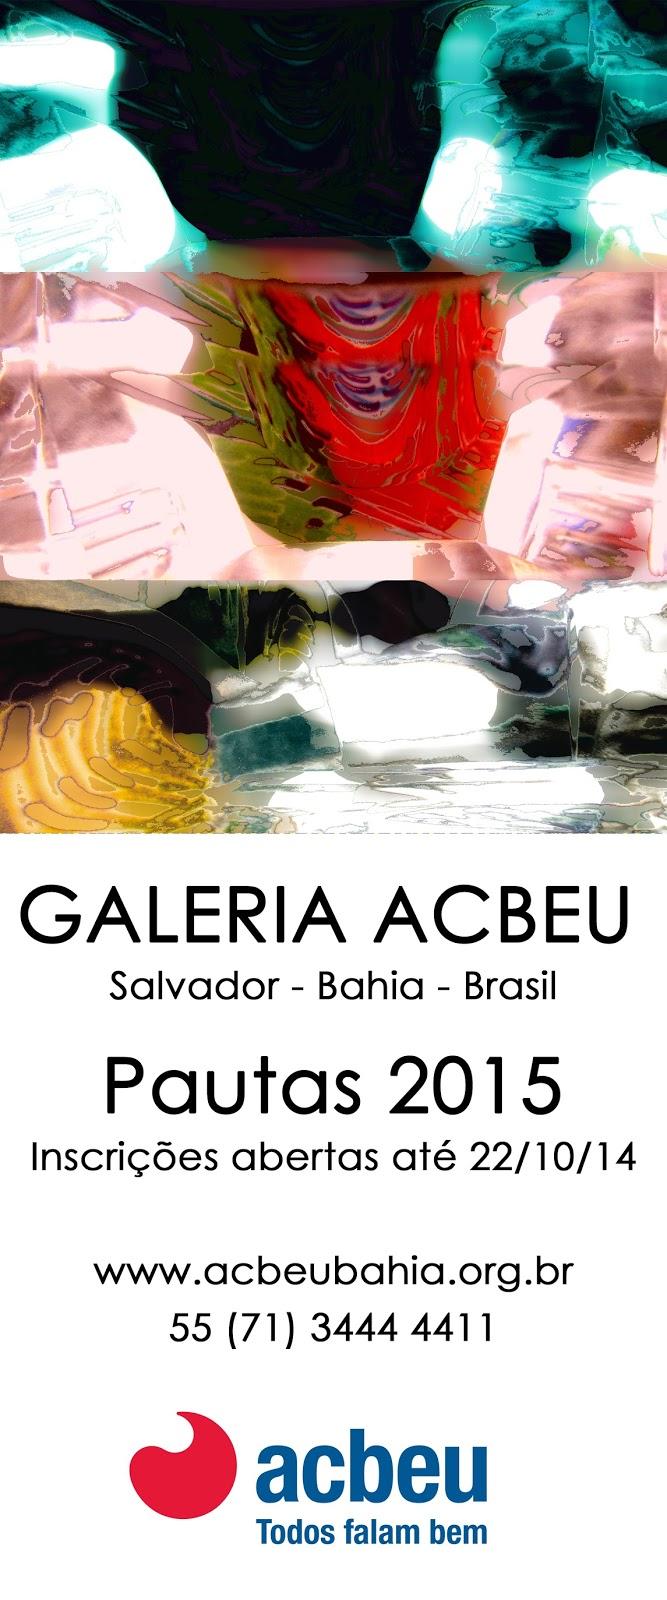 http://www.acbeubahia.org.br/cultural/gal_progExpoPauta.asp?sub2=on